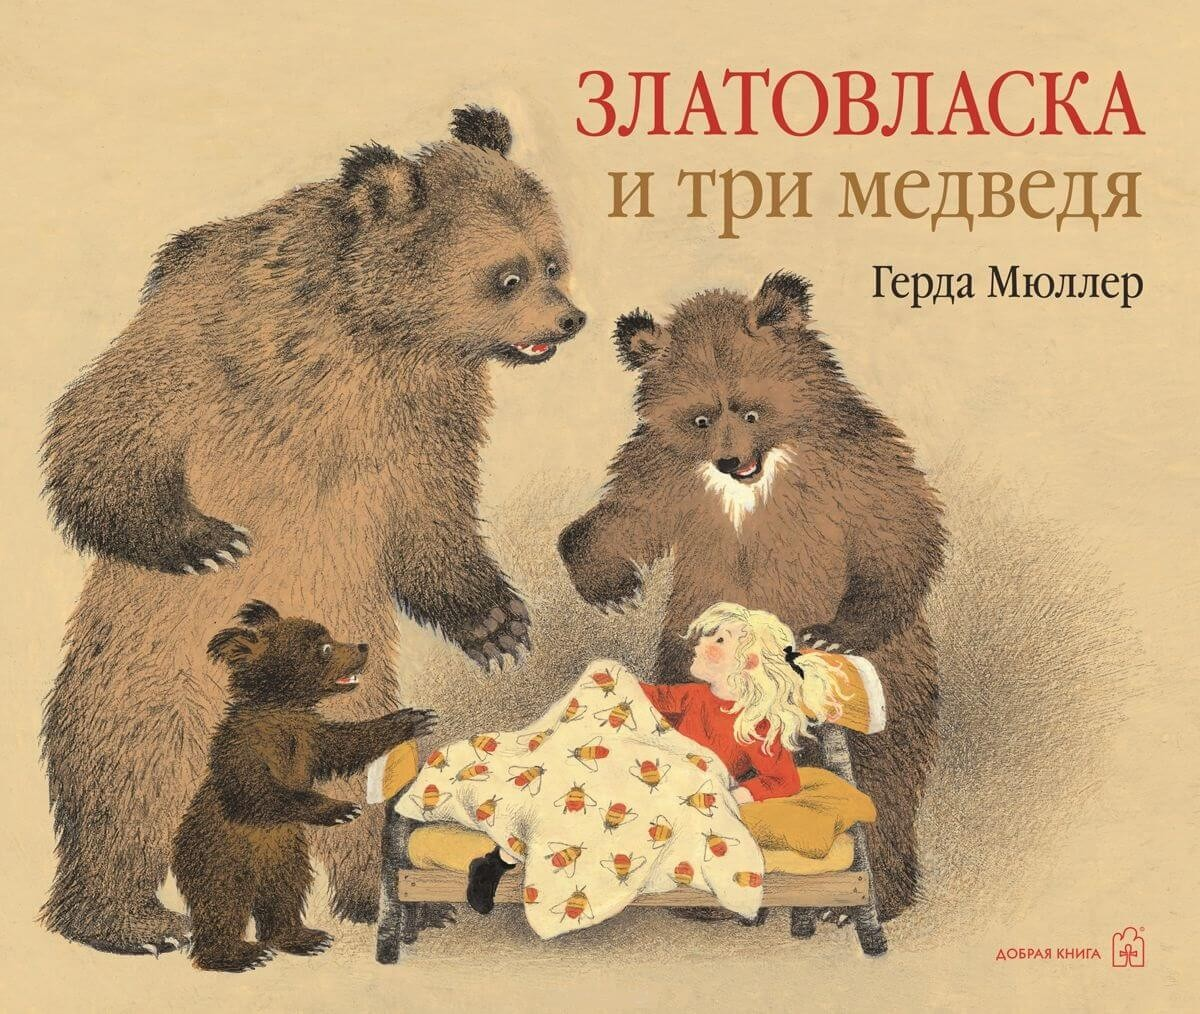 Златовласка и три медведя_img_0